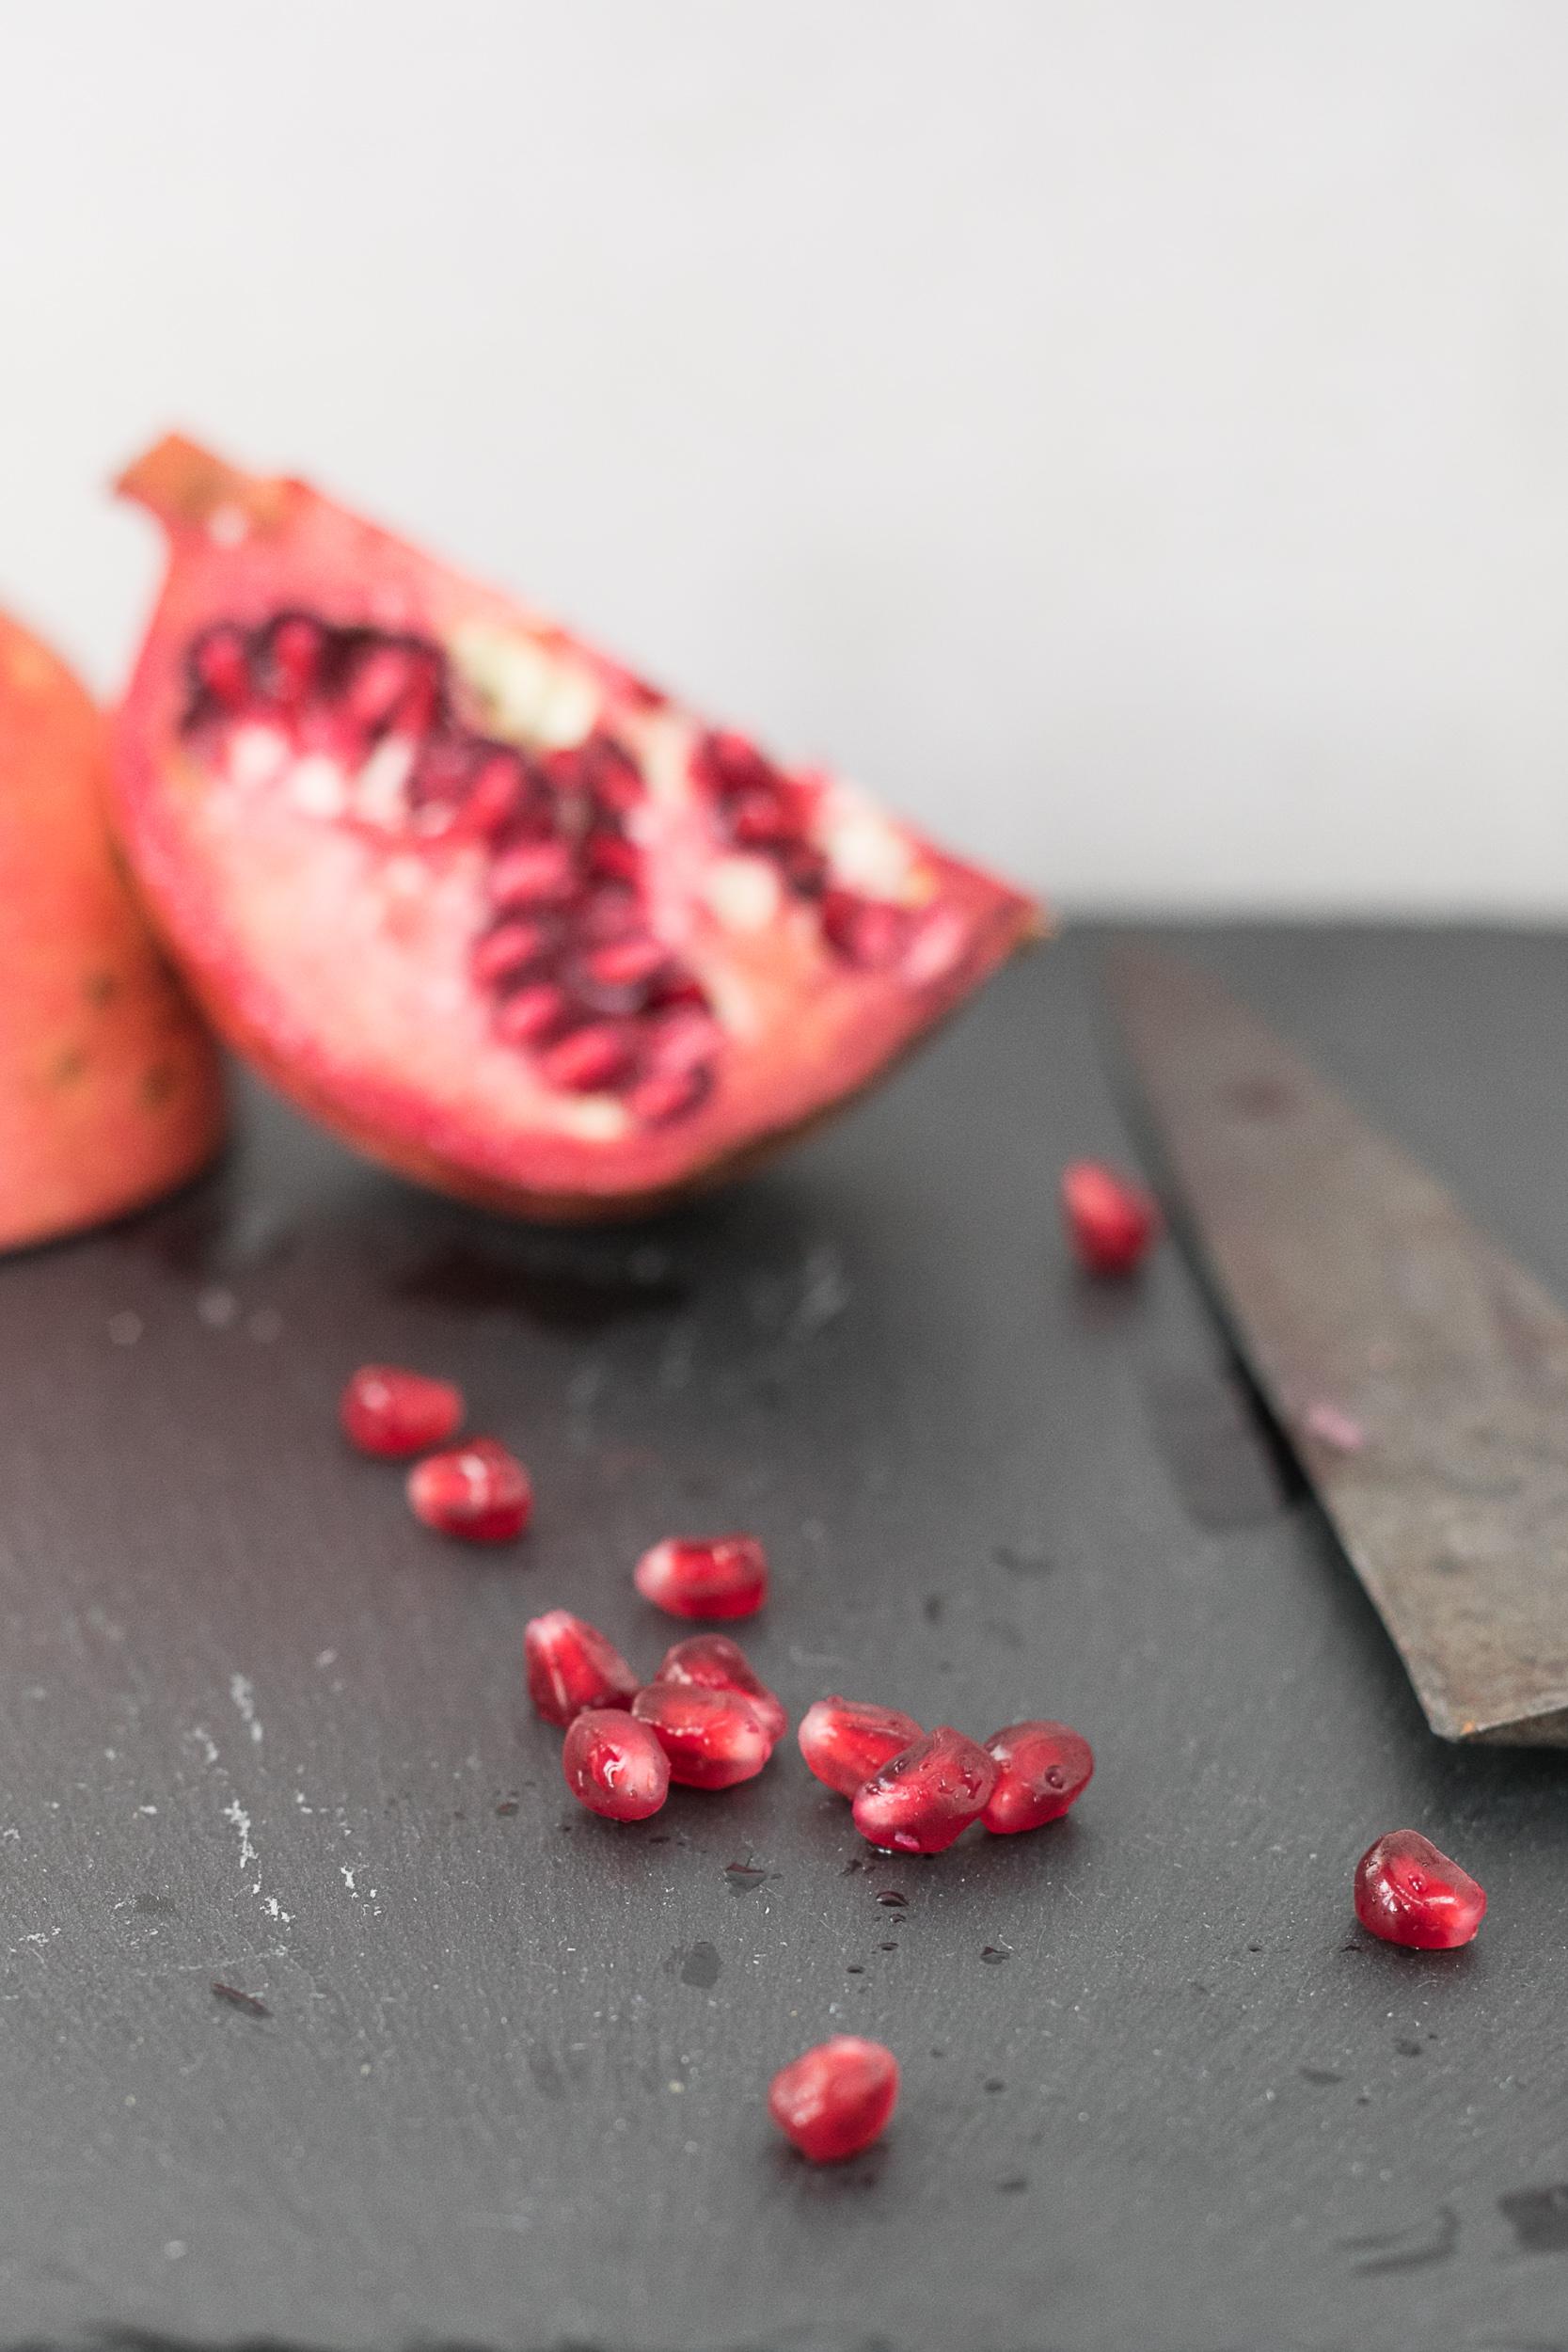 Chloe Edwards food photography Bristol matcha green tea panna cotta with pomegranates-1120.jpg